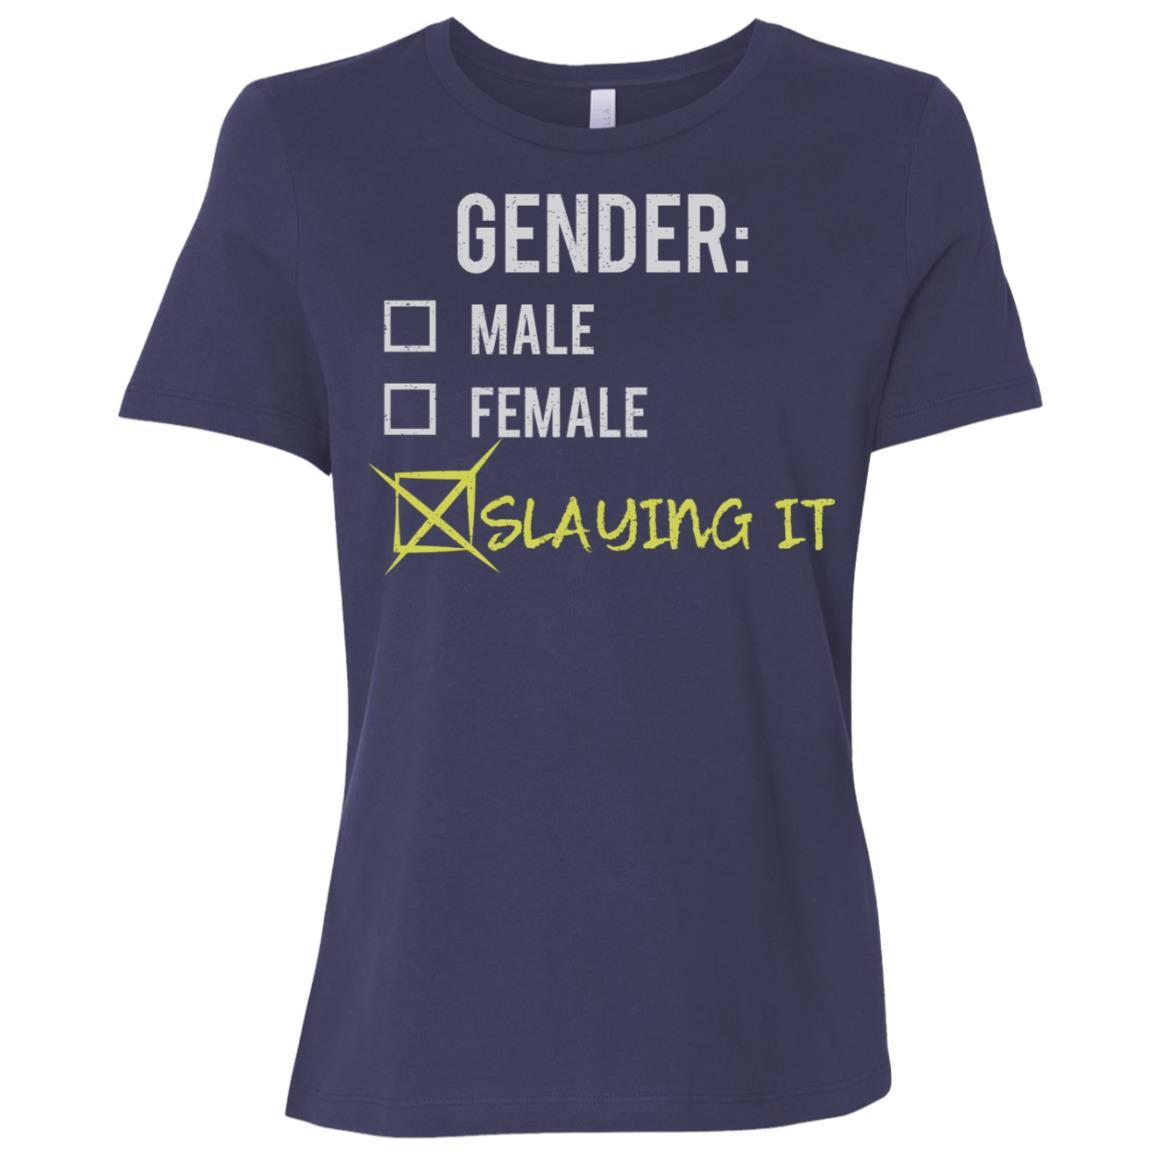 Male Female Slaying It Gender Nonbinary Trans Women Short Sleeve T-Shirt